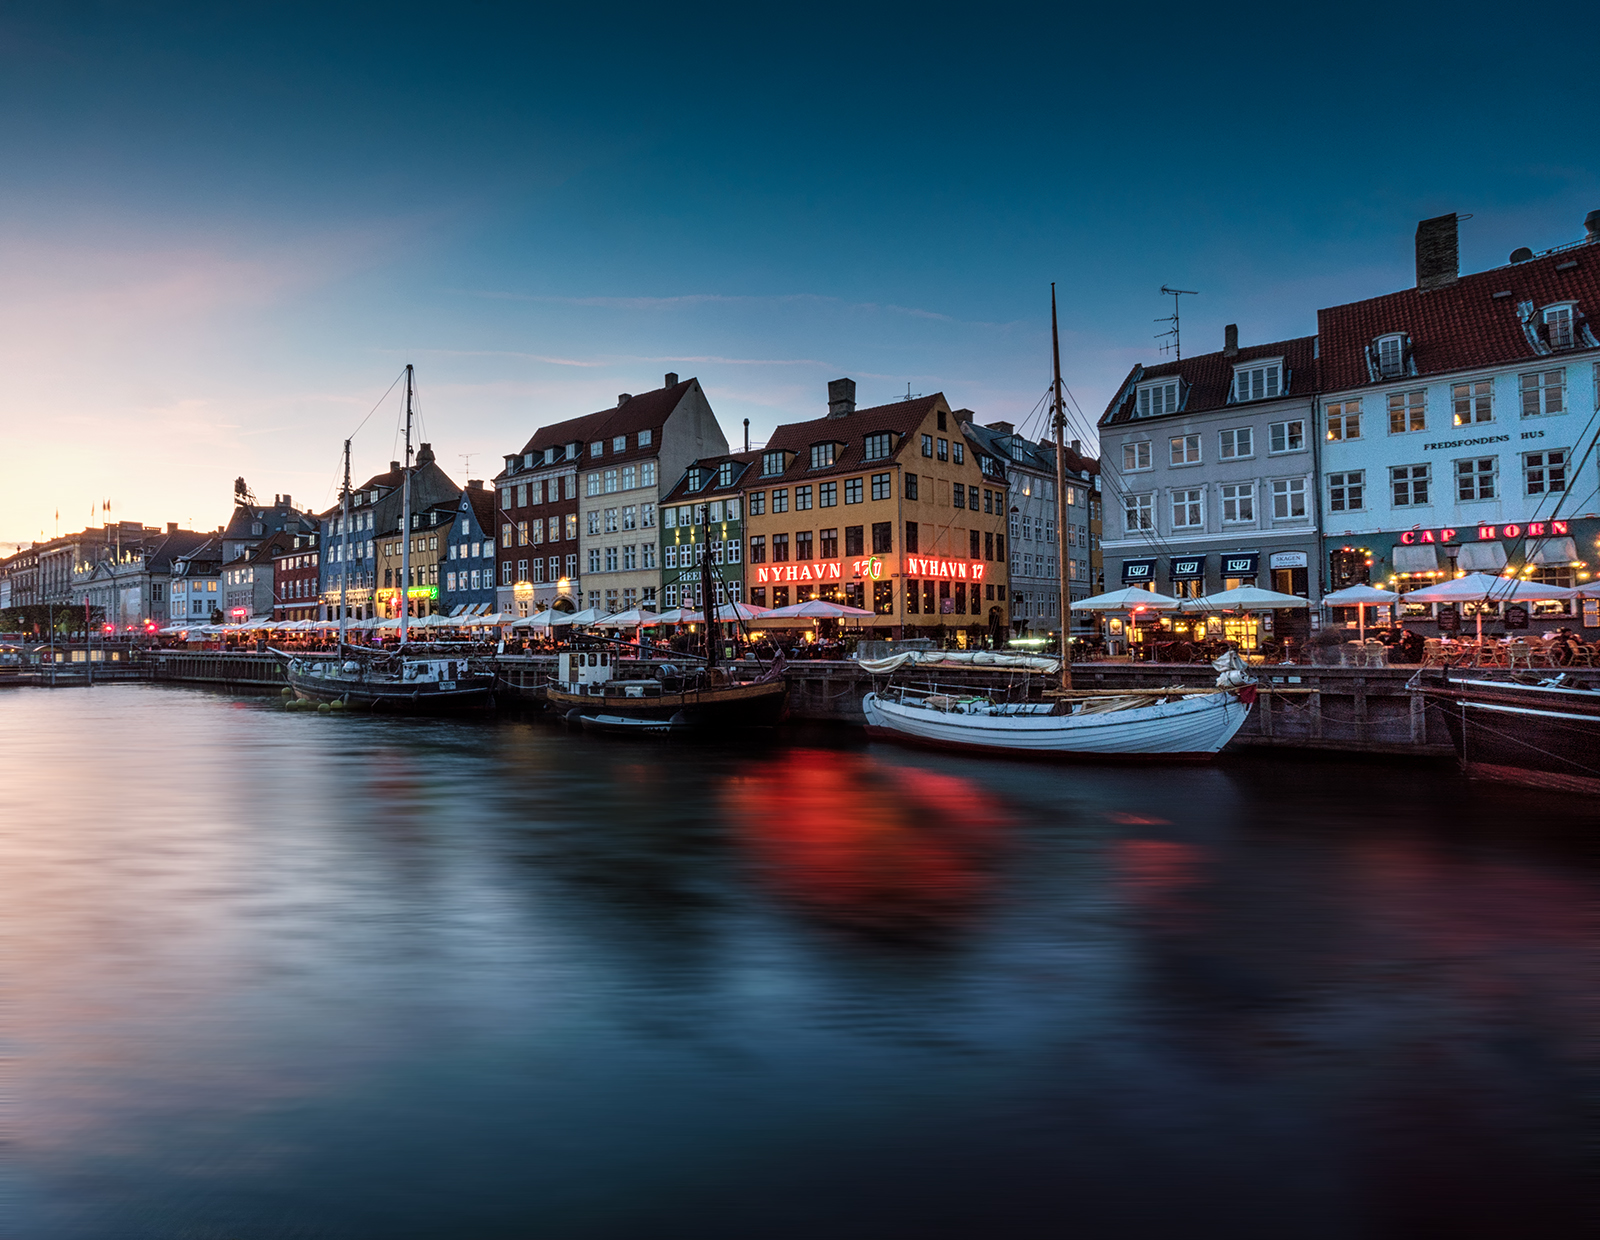 Copenhagen, Denmark, Nyhavn, long exposure, sony, sony a6500, hdr, water, boats, sunset.